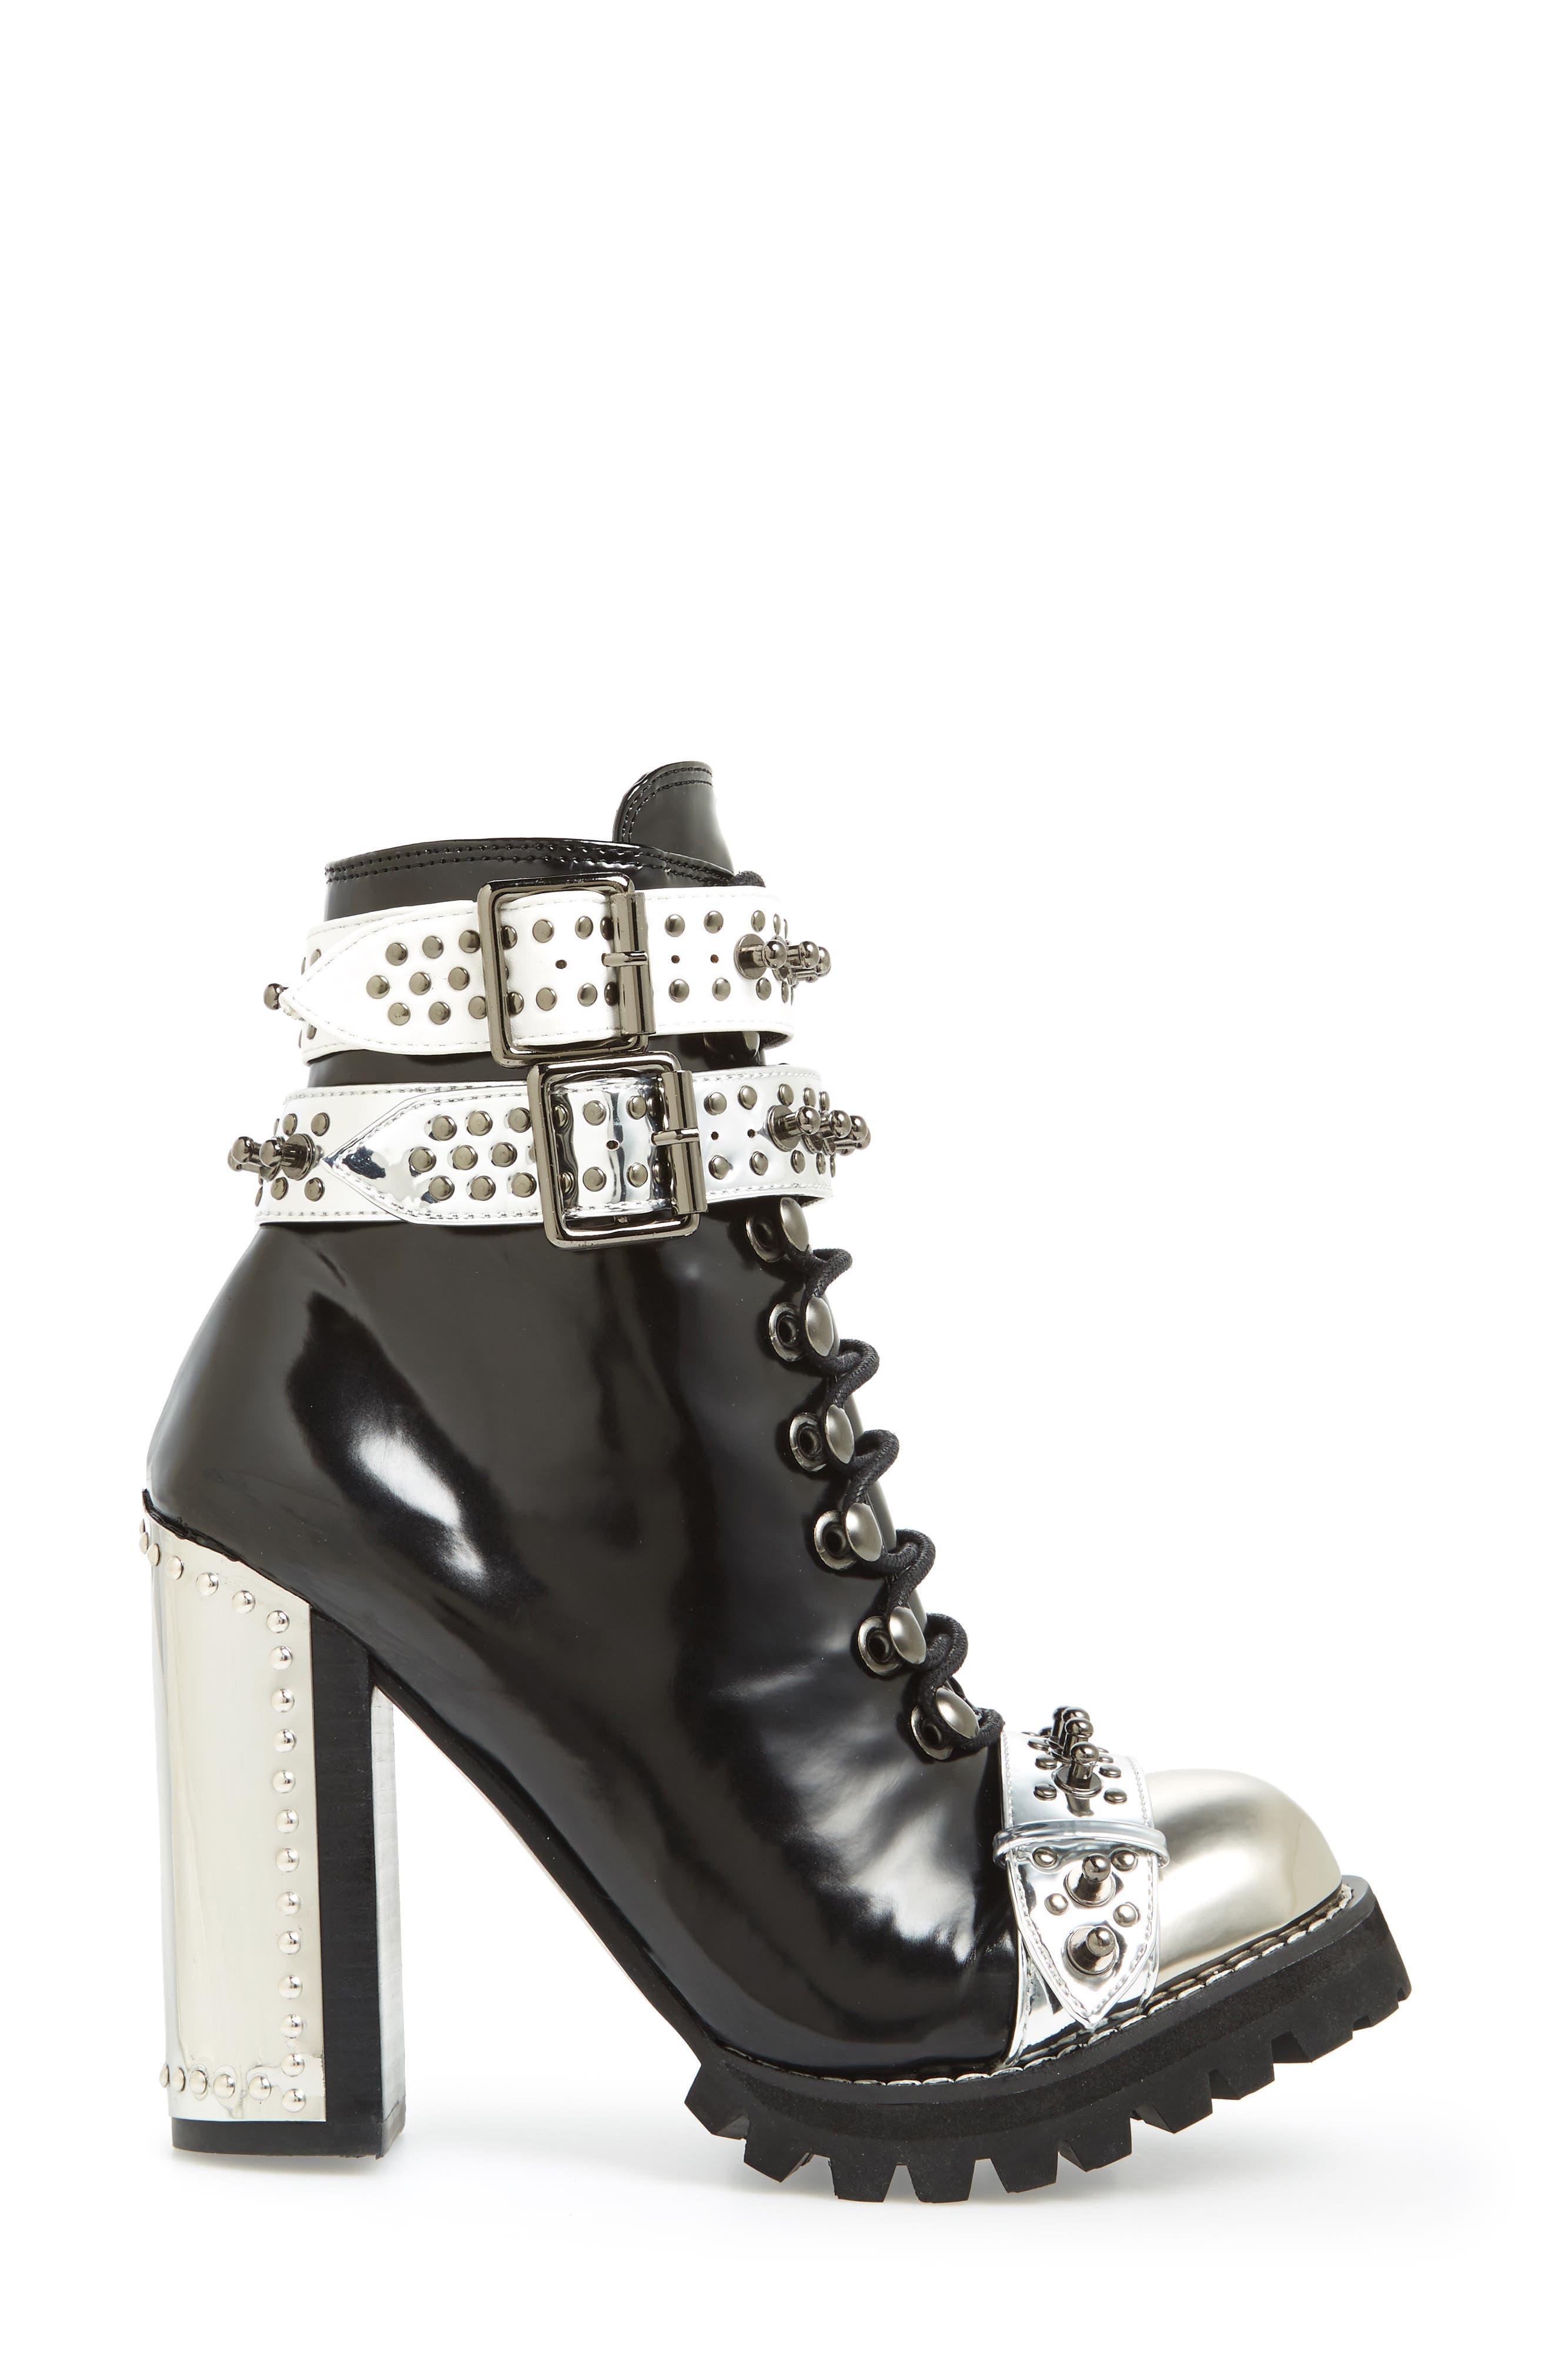 Scorpius Armored Lug Boot,                             Alternate thumbnail 3, color,                             Black Box Silver White